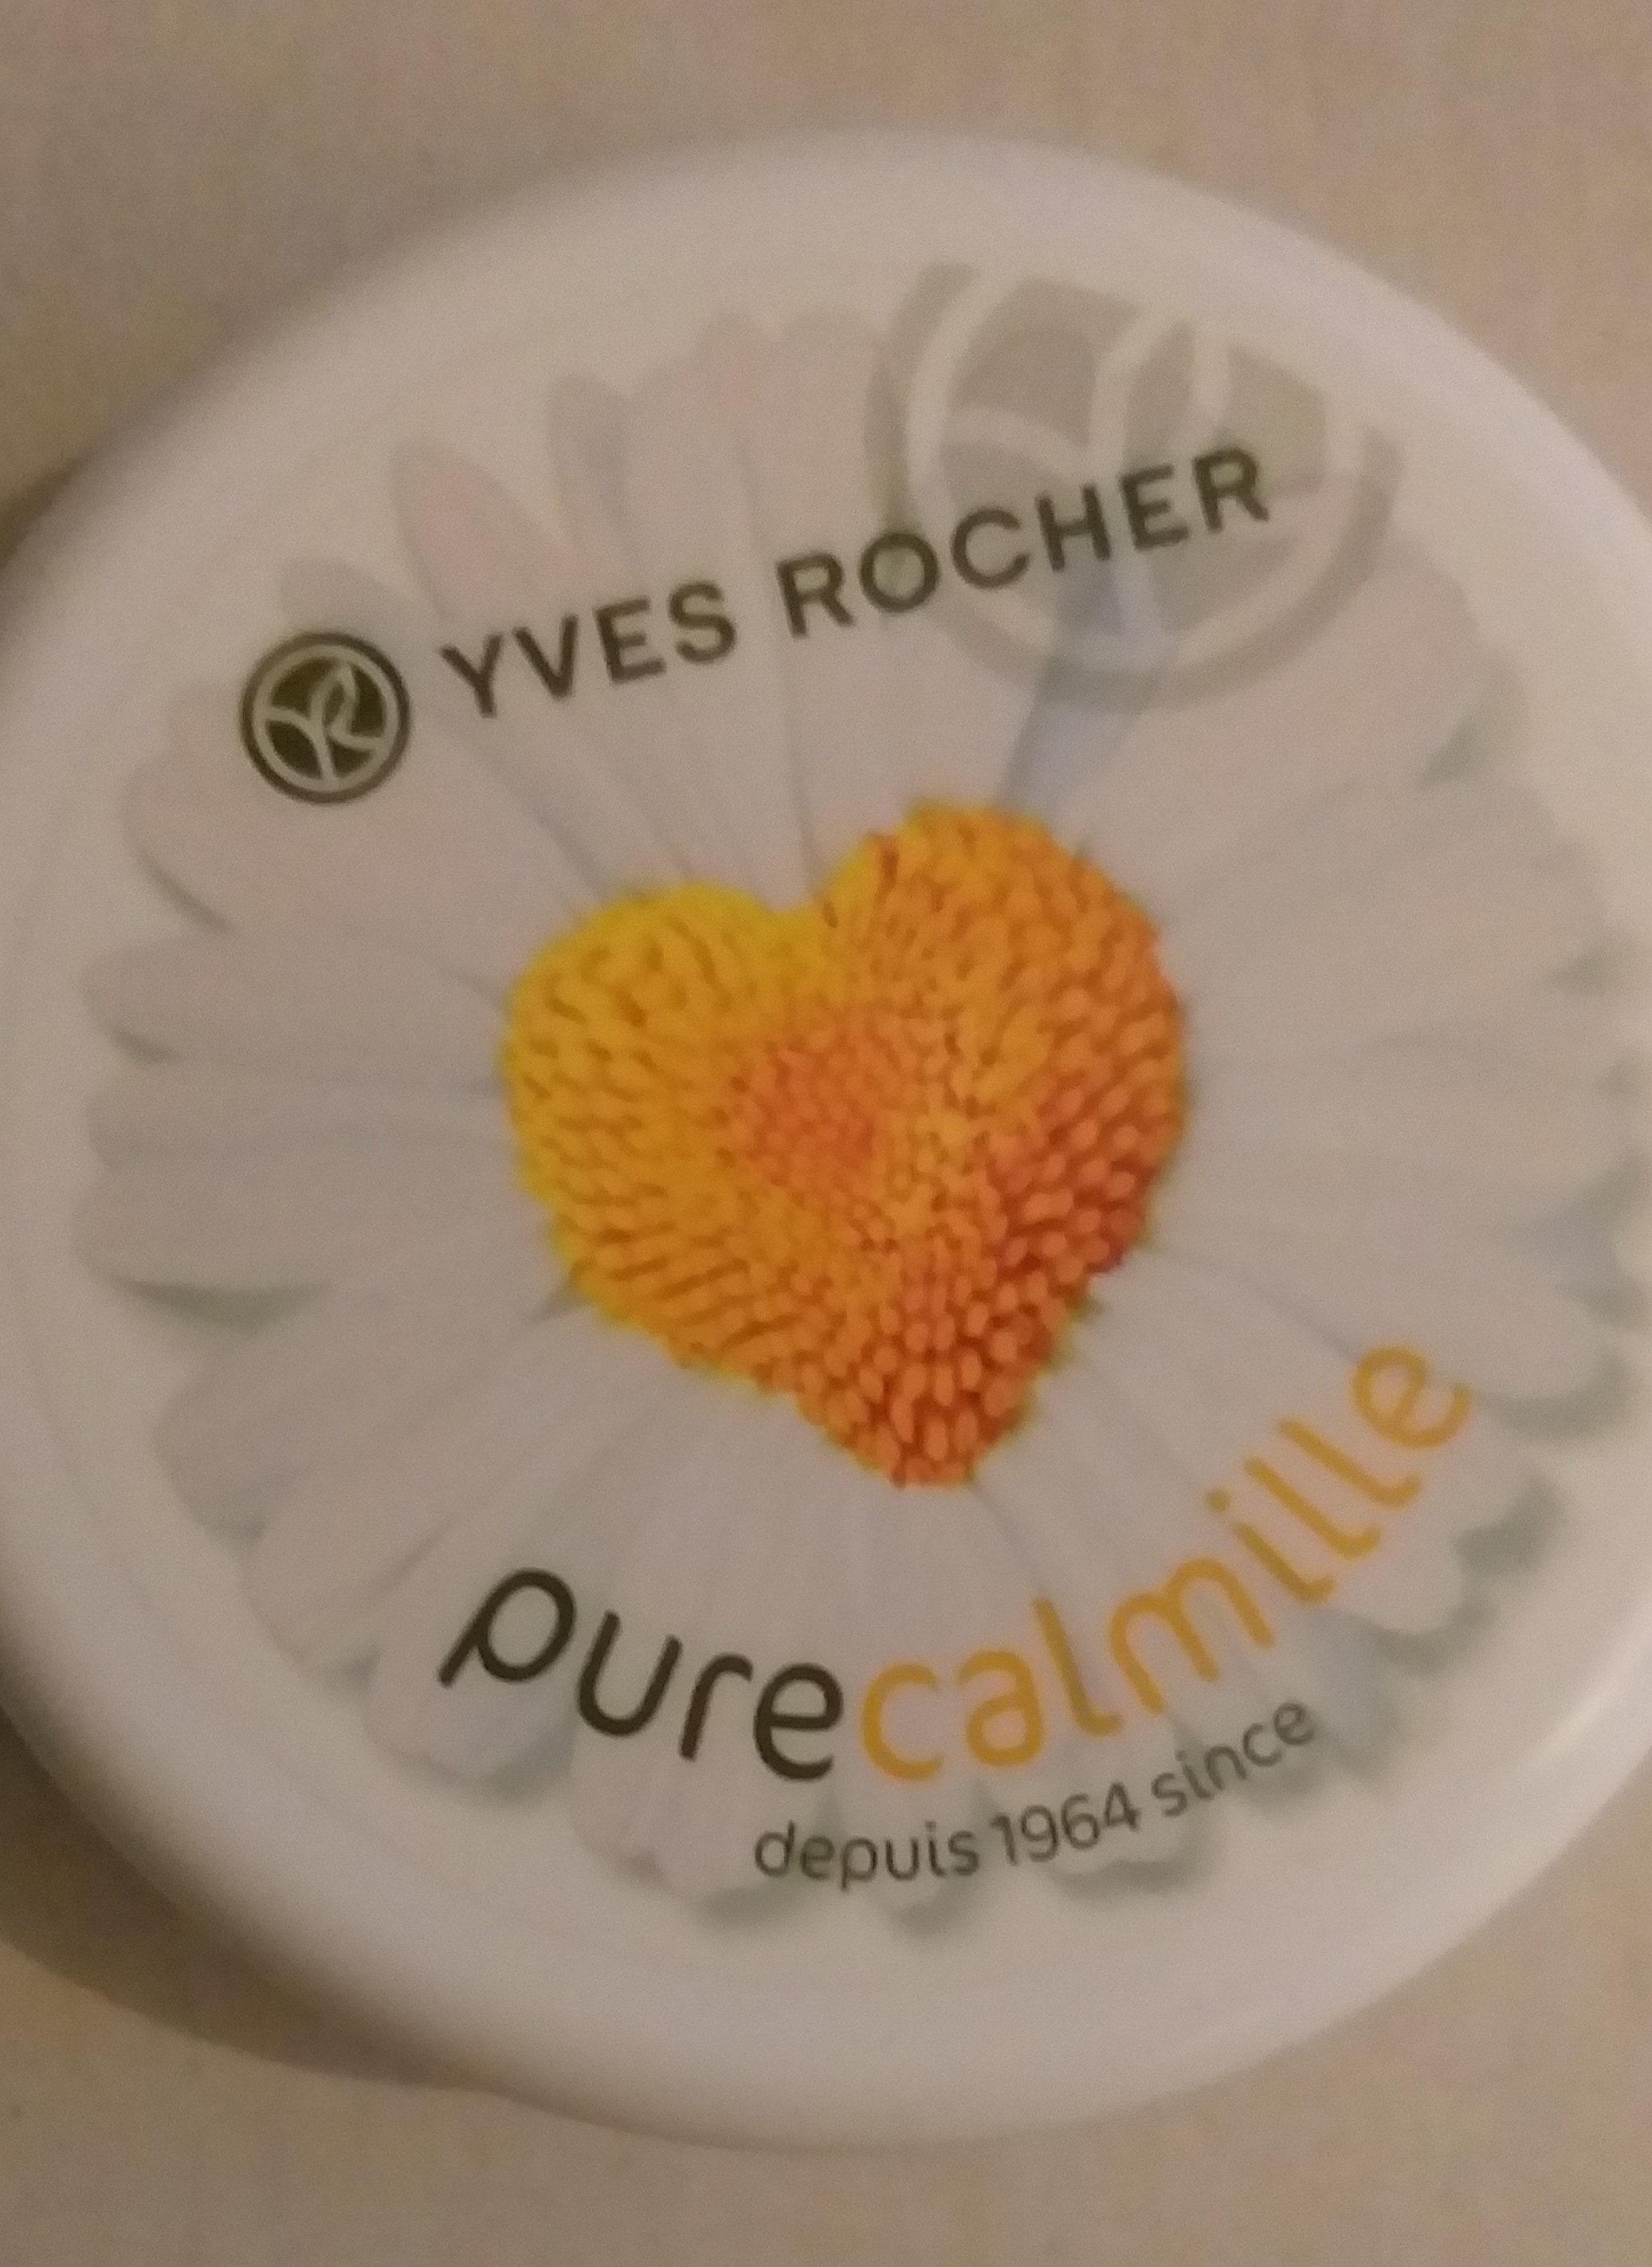 purecalmille - Product - fr